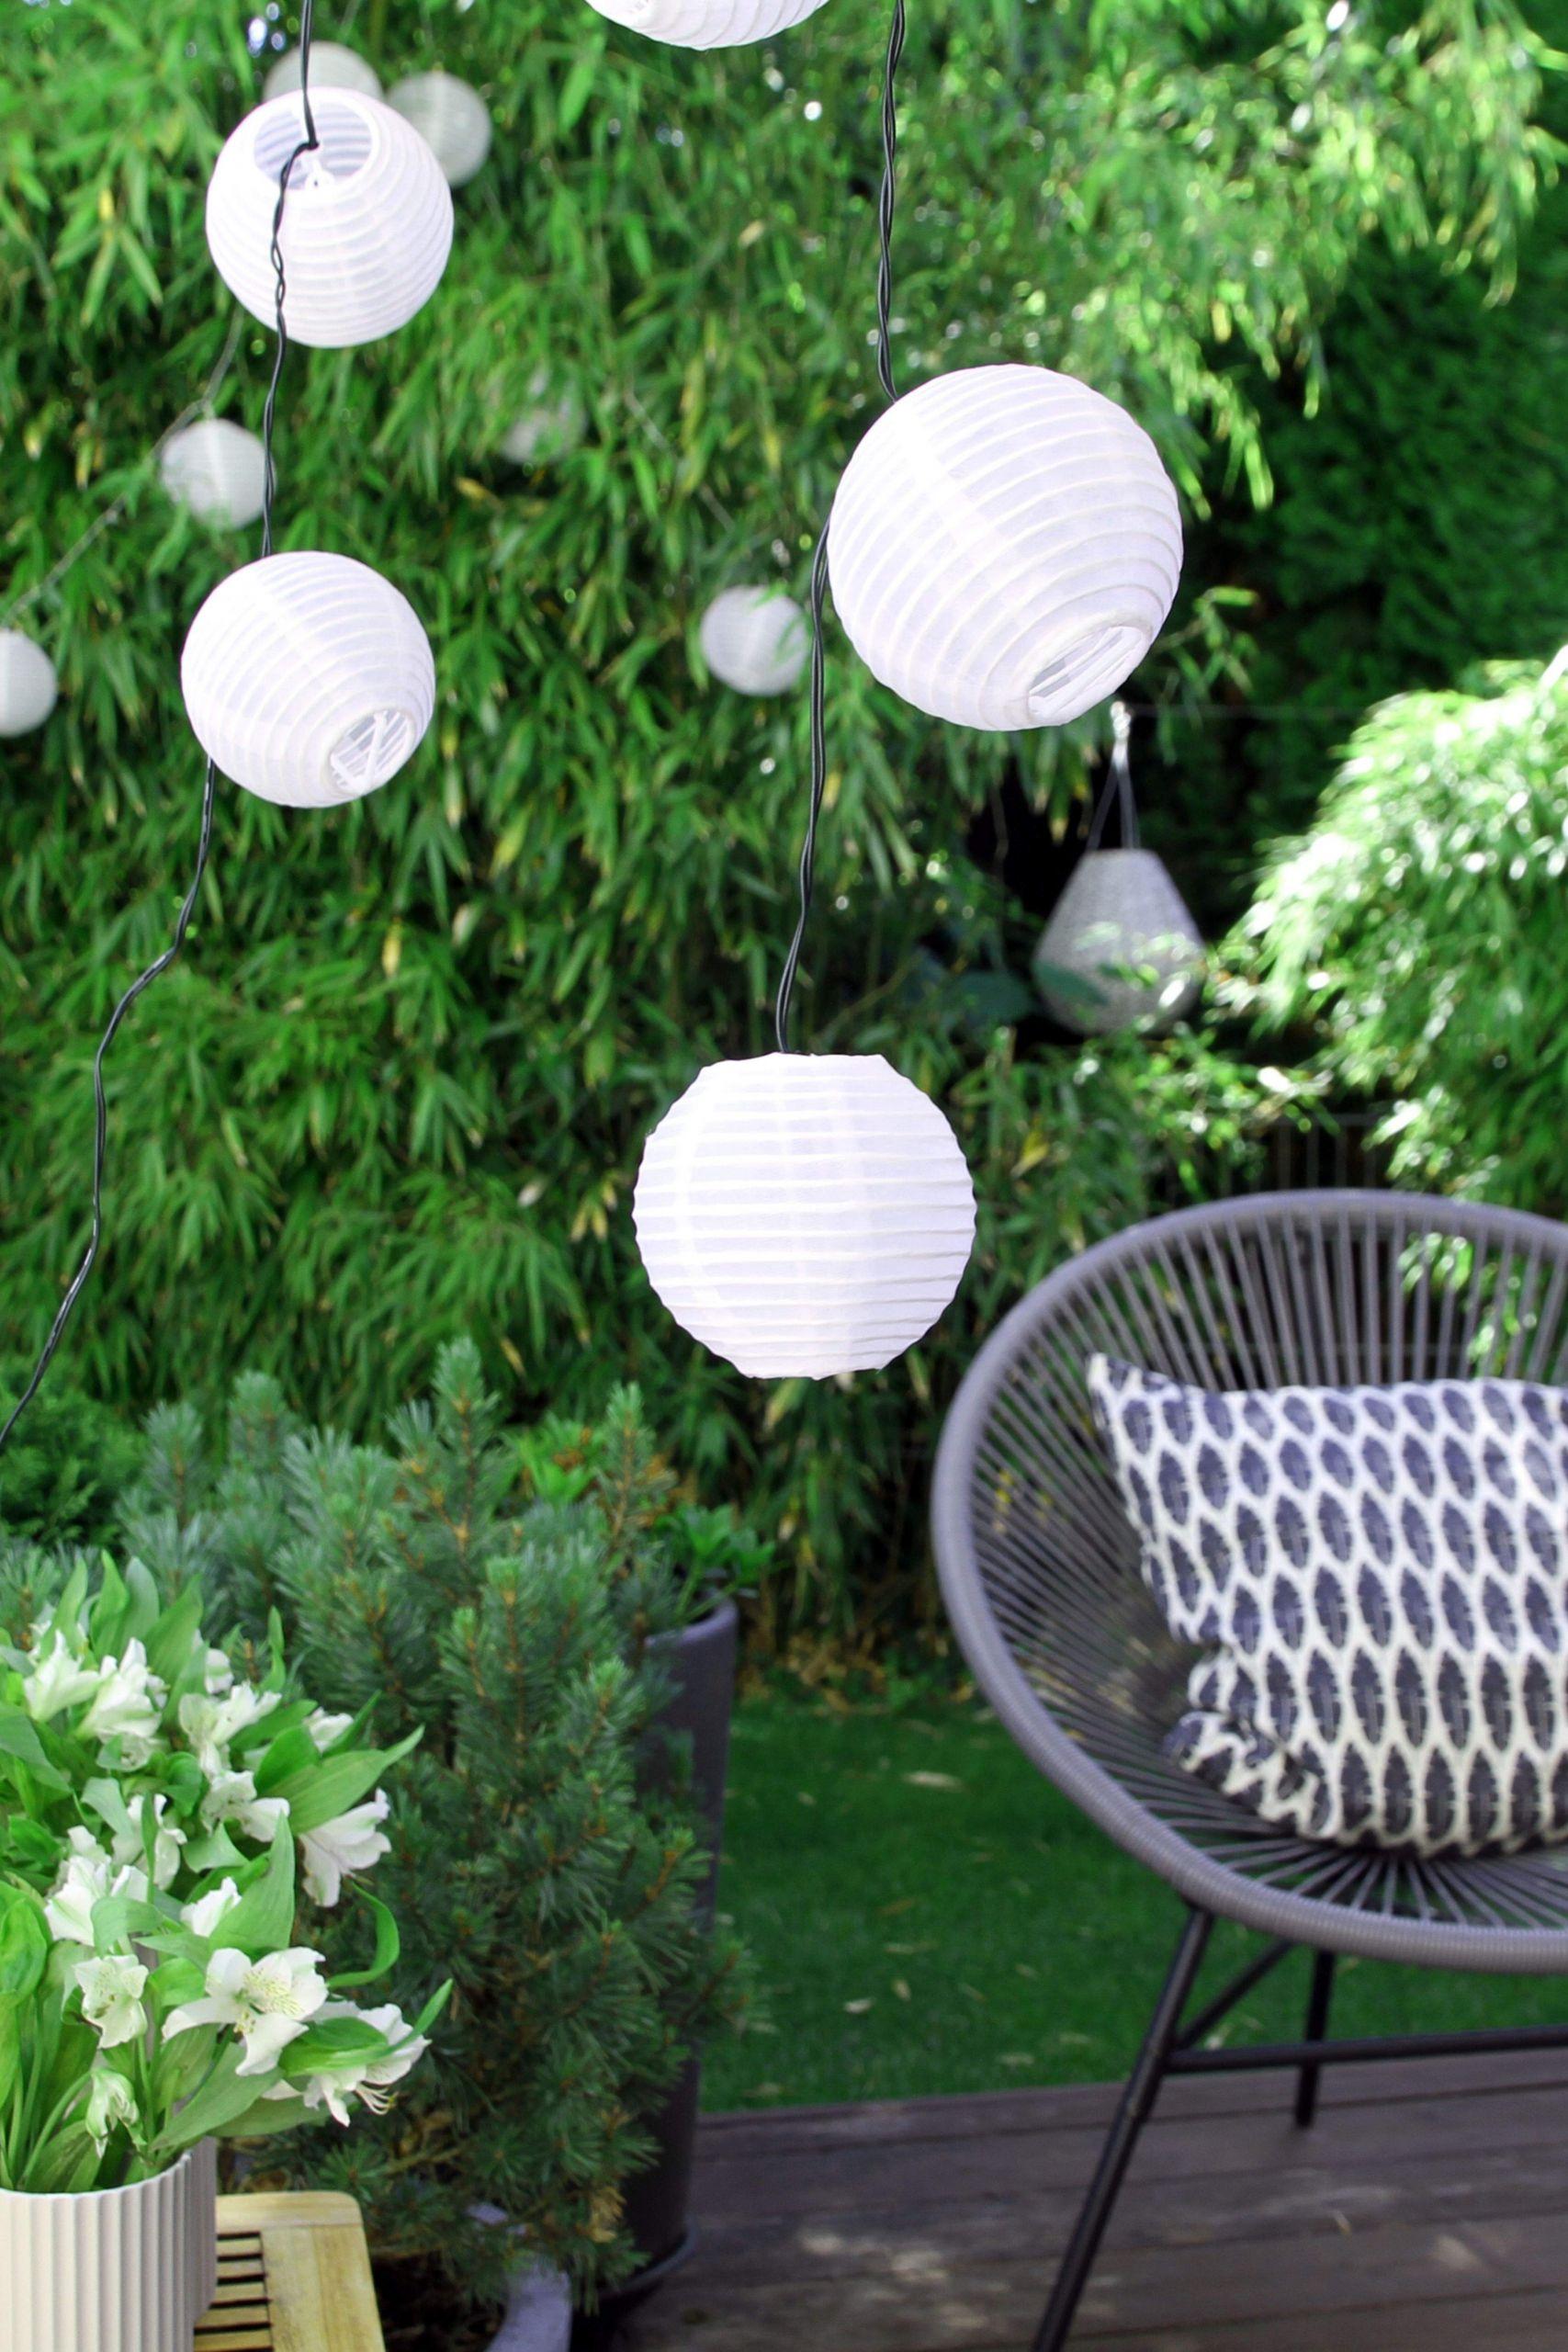 Lampions Garten Wetterfest Schön 30 Reizend Led Lampions Garten Reizend